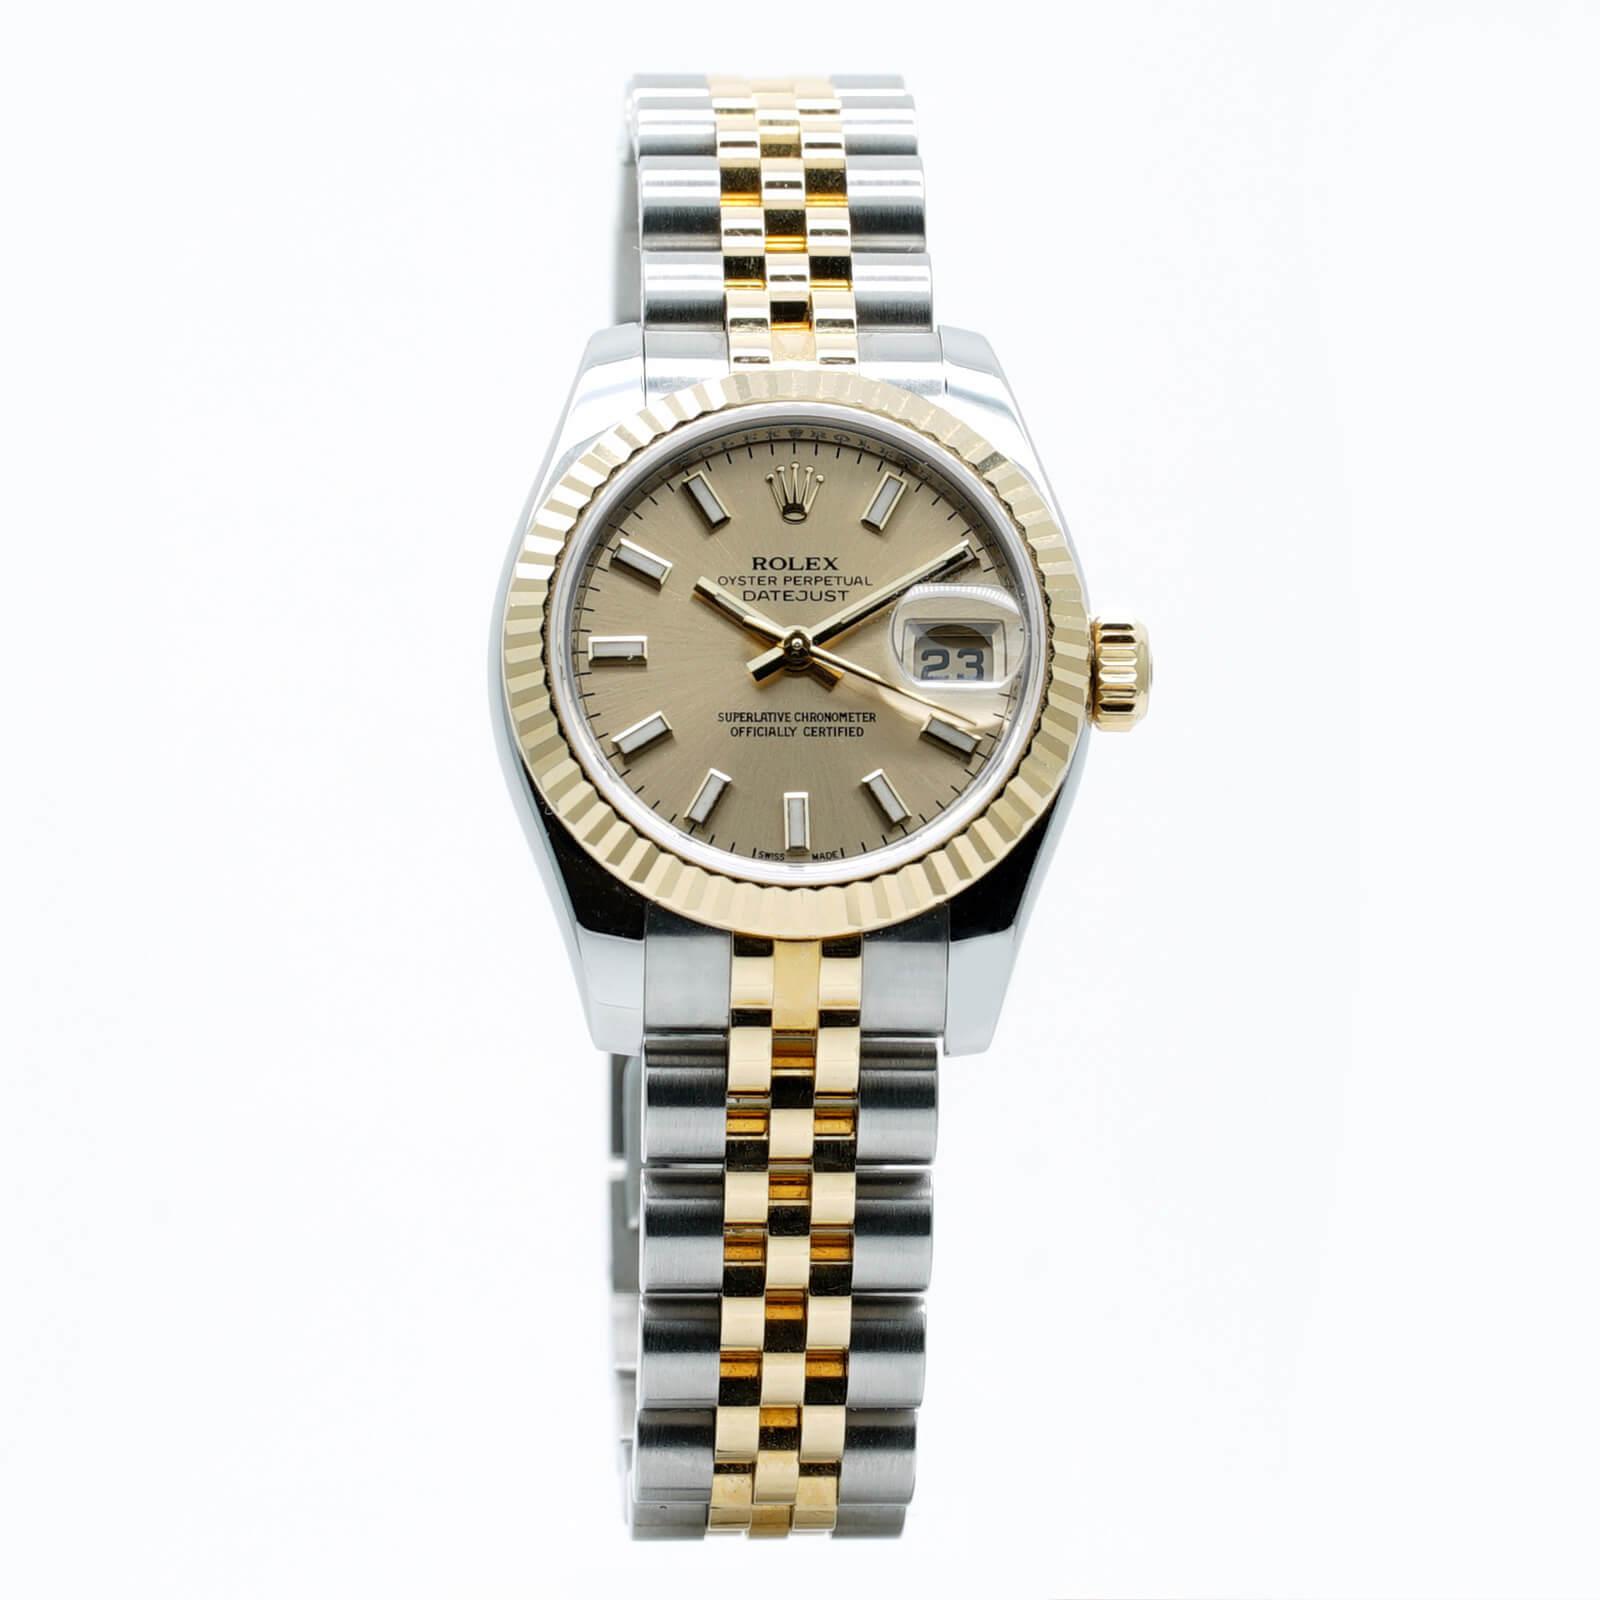 0763f76703e0 Montre-Rolex-Lady-Datejust-occasion-Lionel-Meylan-Horlogerie-